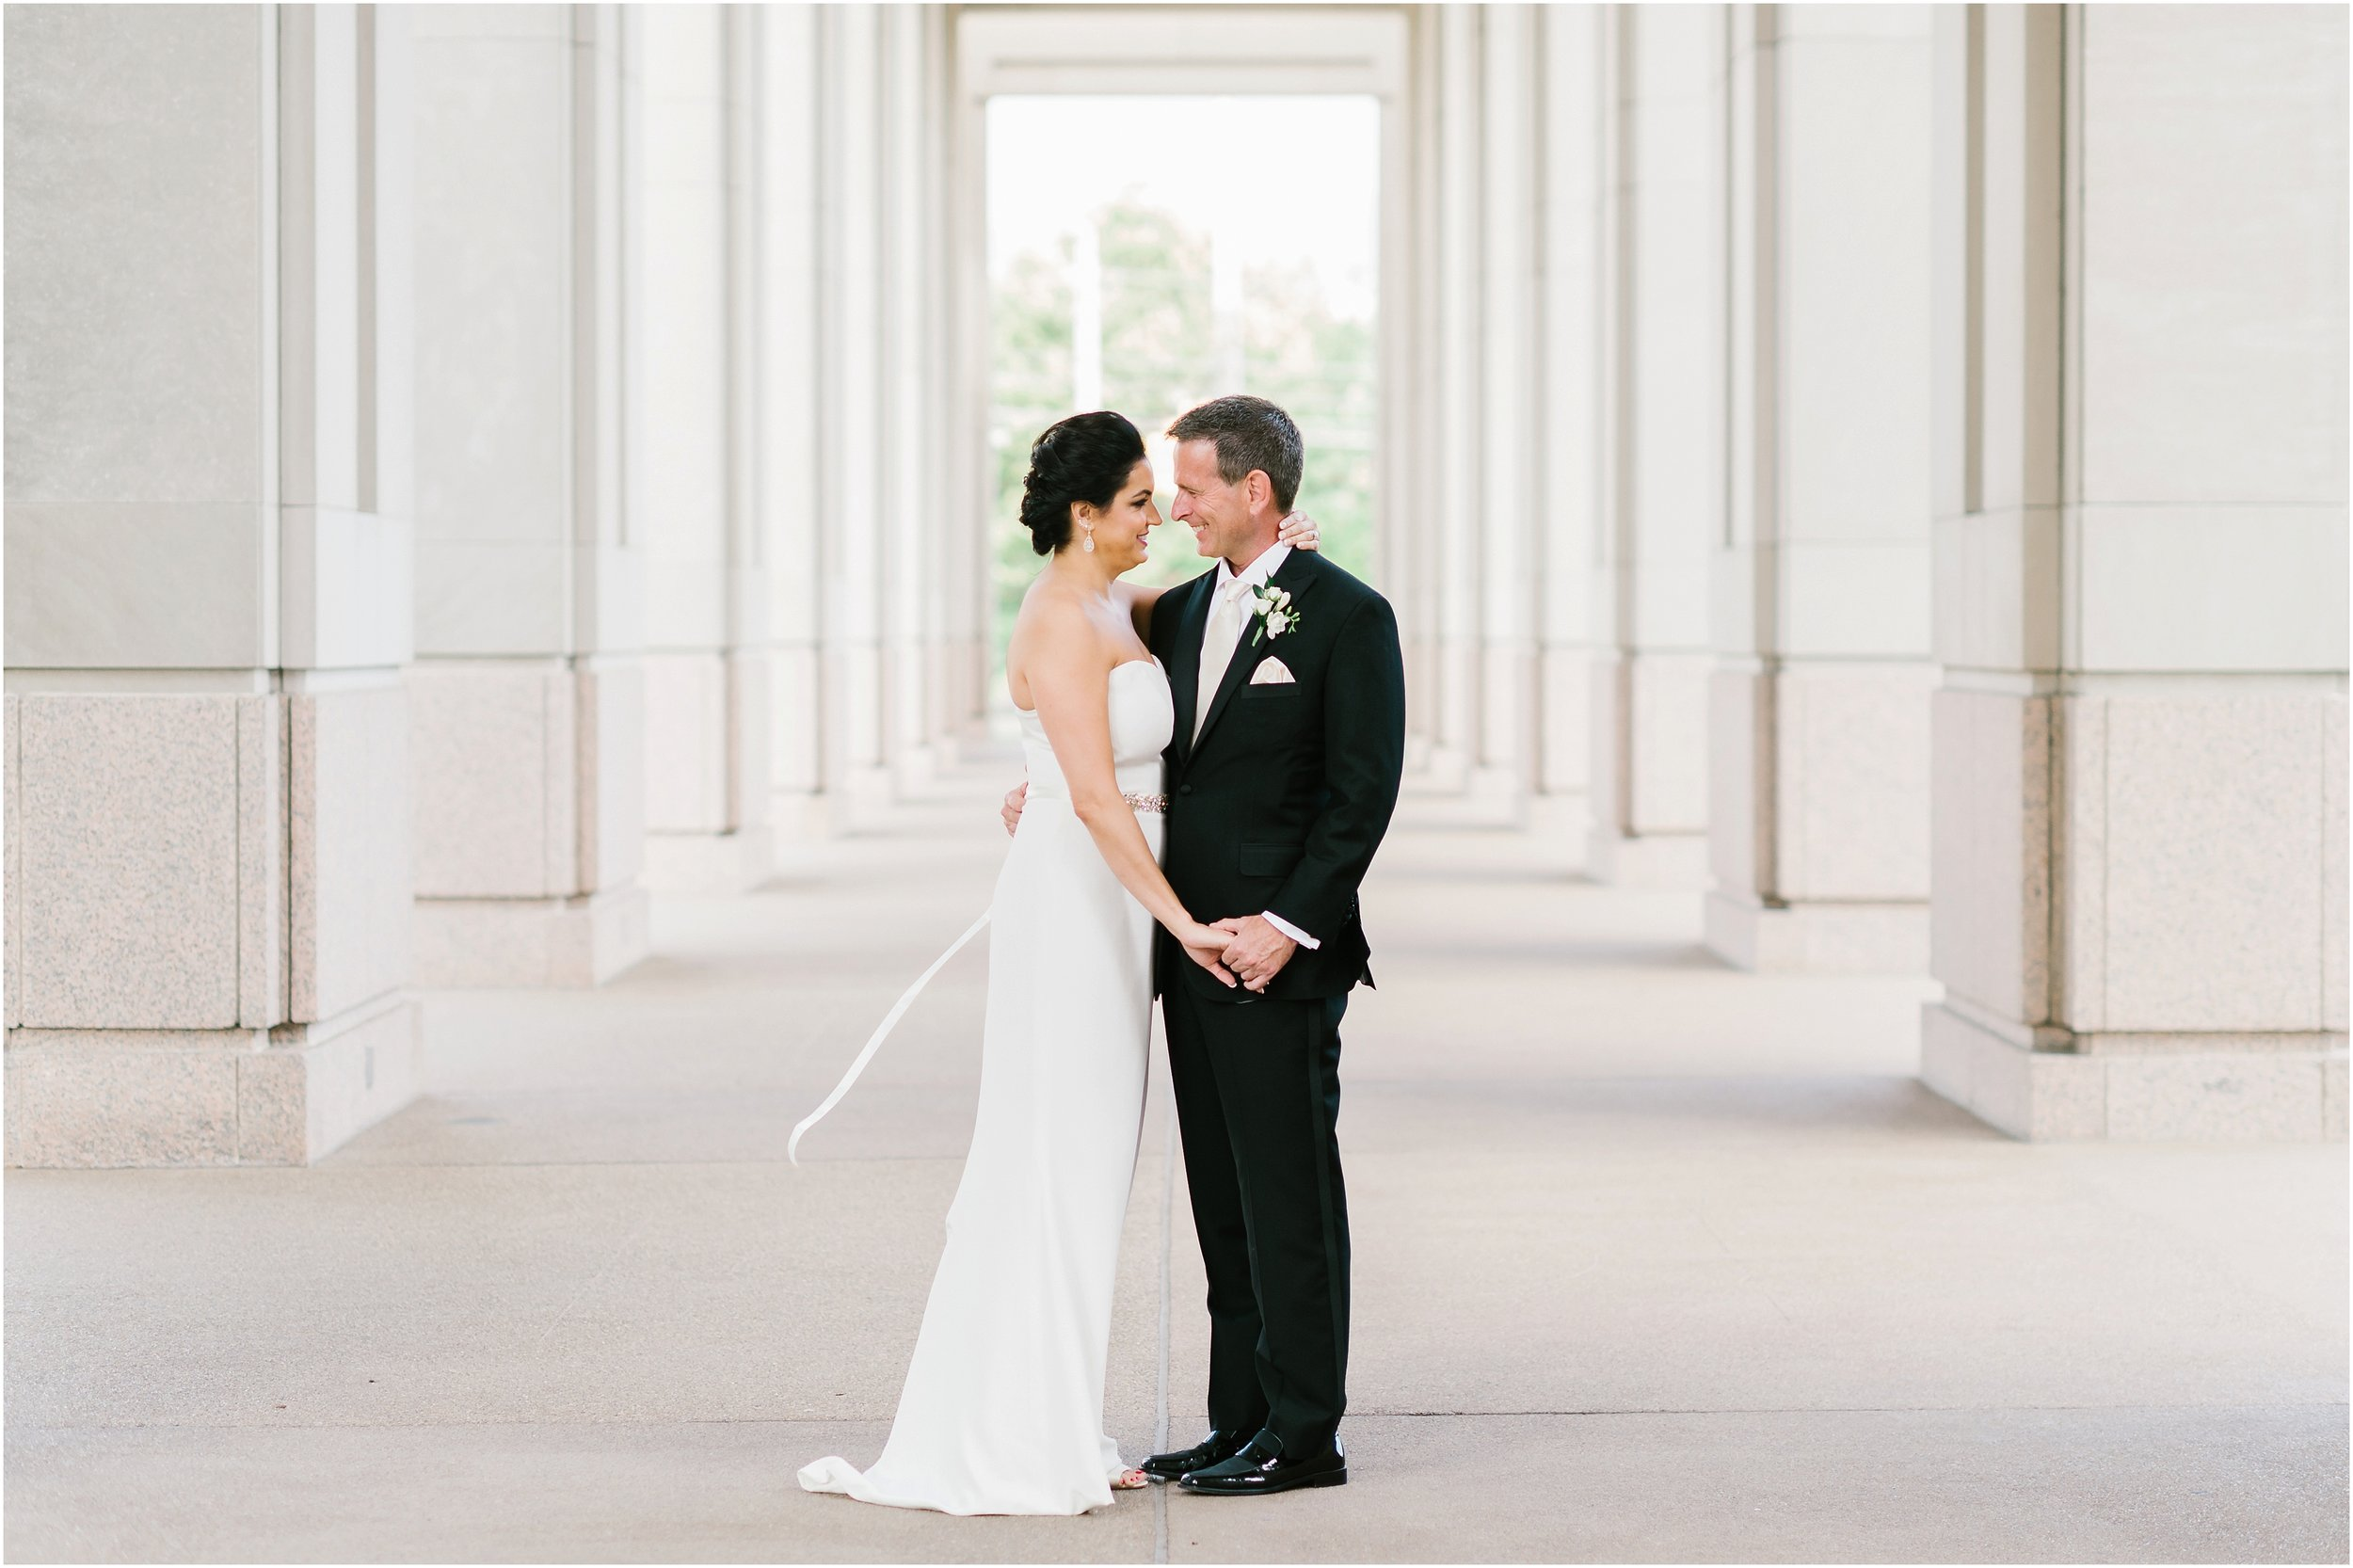 Rebecca_Shehorn_Photography_Indianapolis_Wedding_Photographer_8550.jpg